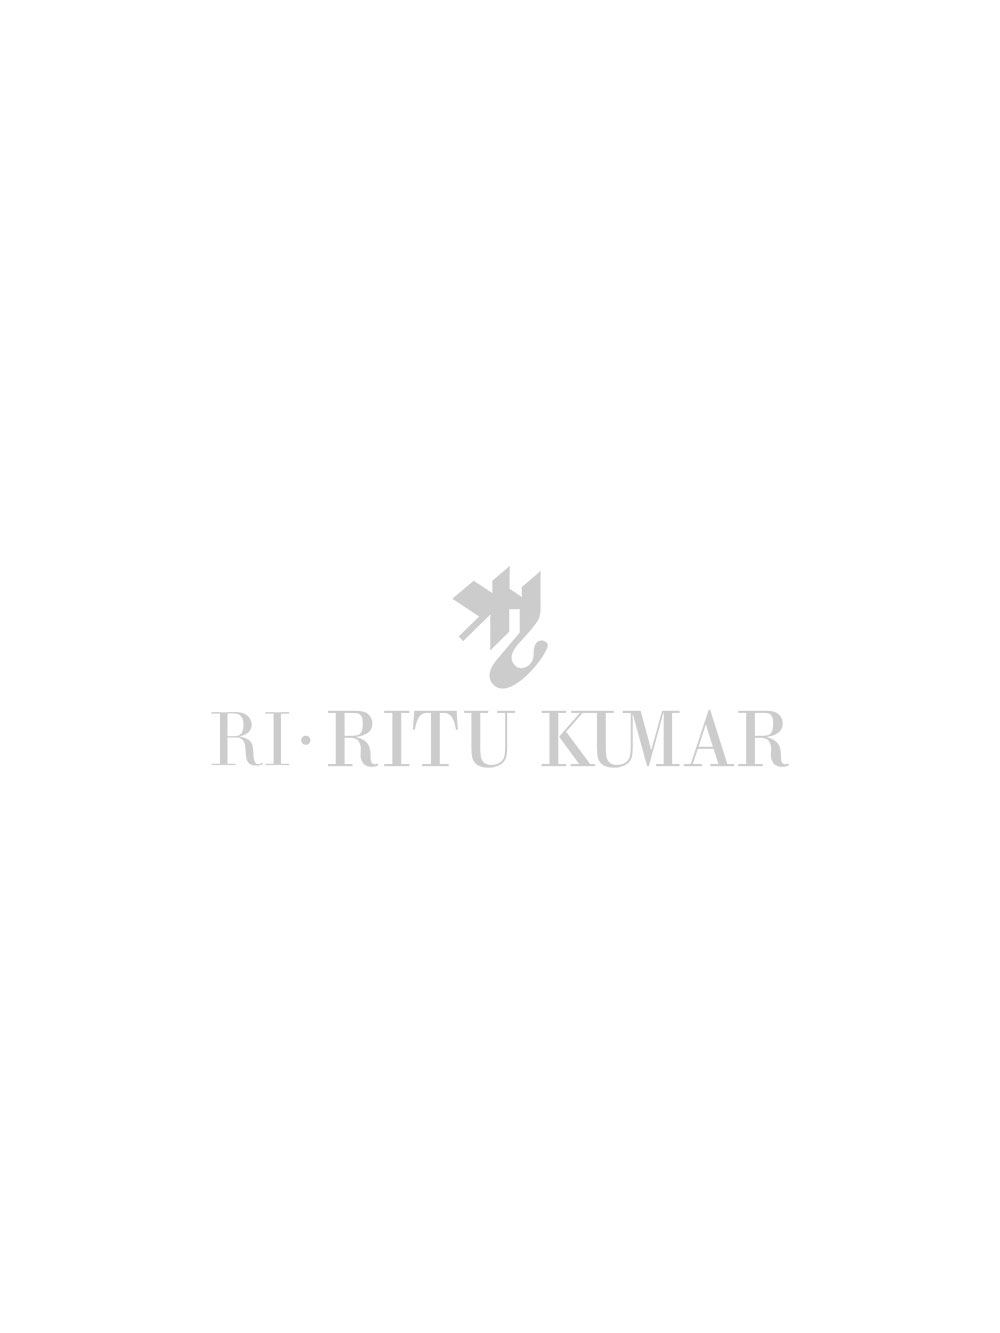 Indigo & White Embroidered Kurta With Dupatta And Churidar